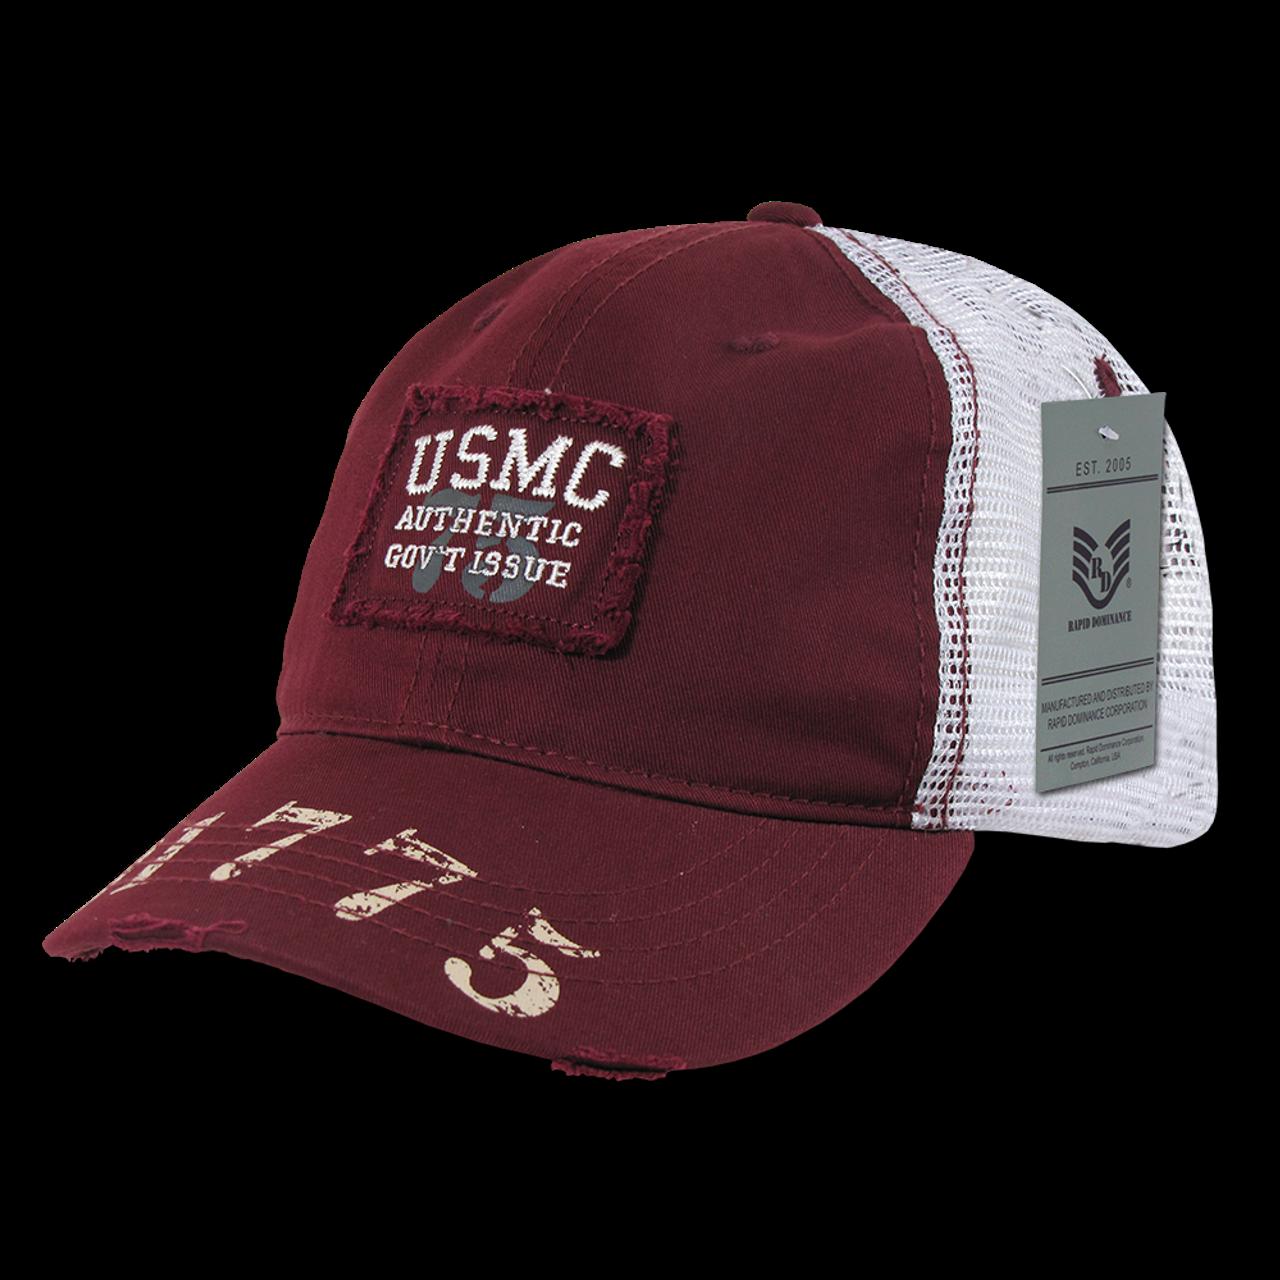 904cefe5007 S85 - Marines Cap USMC Vintage Military Patch Mesh Maroon -  USMILITARYHATS.COM